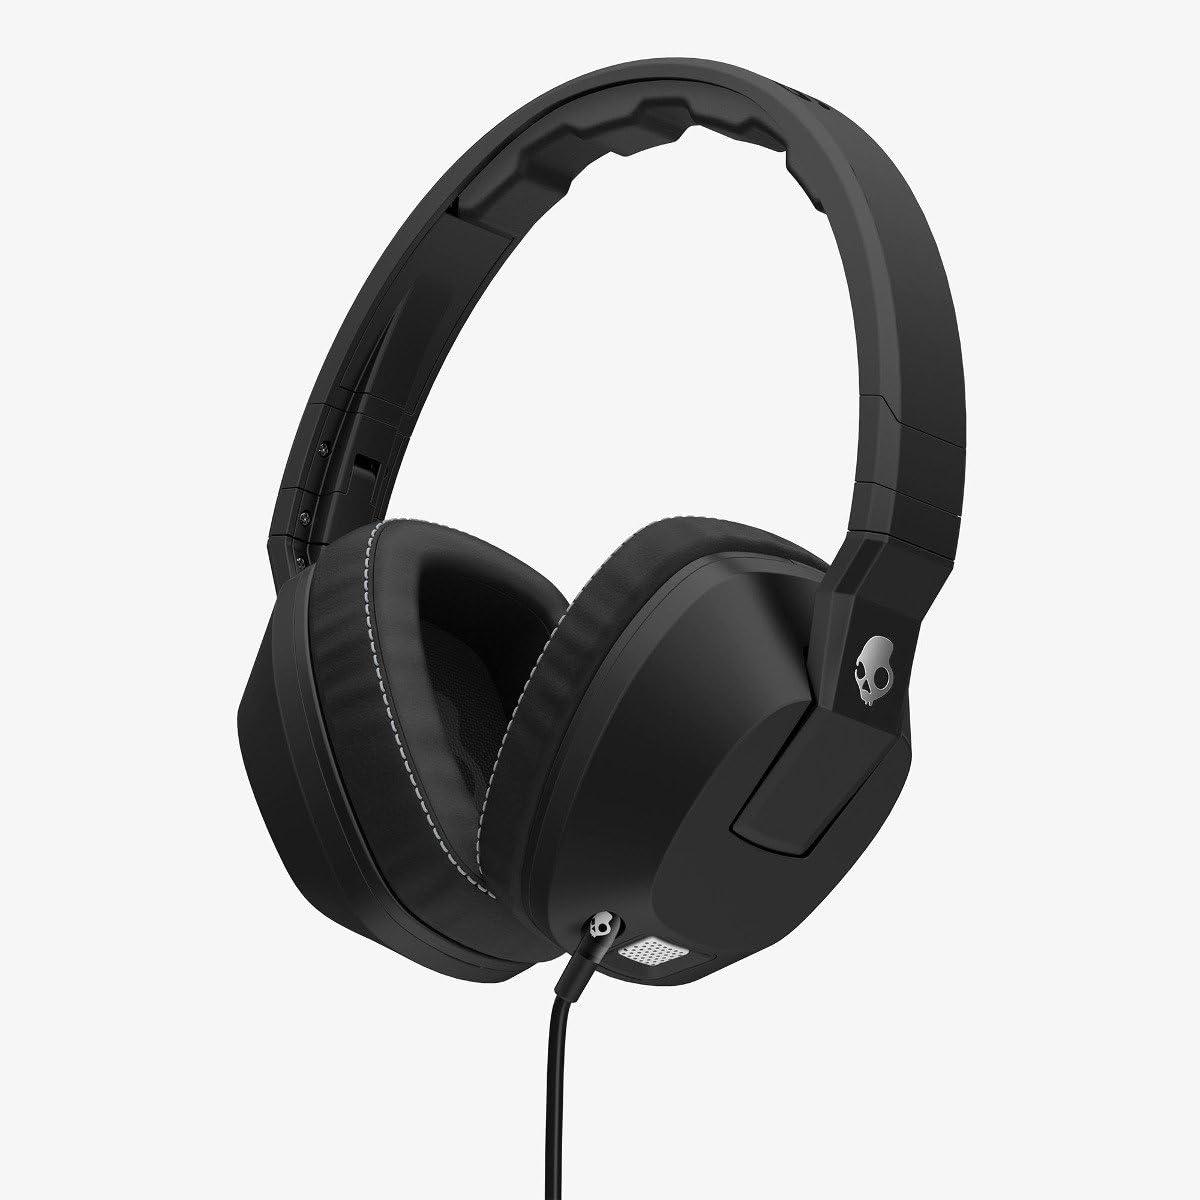 Skullcandy Crusher Headphones with Built-in Amplifier and Mic, Black